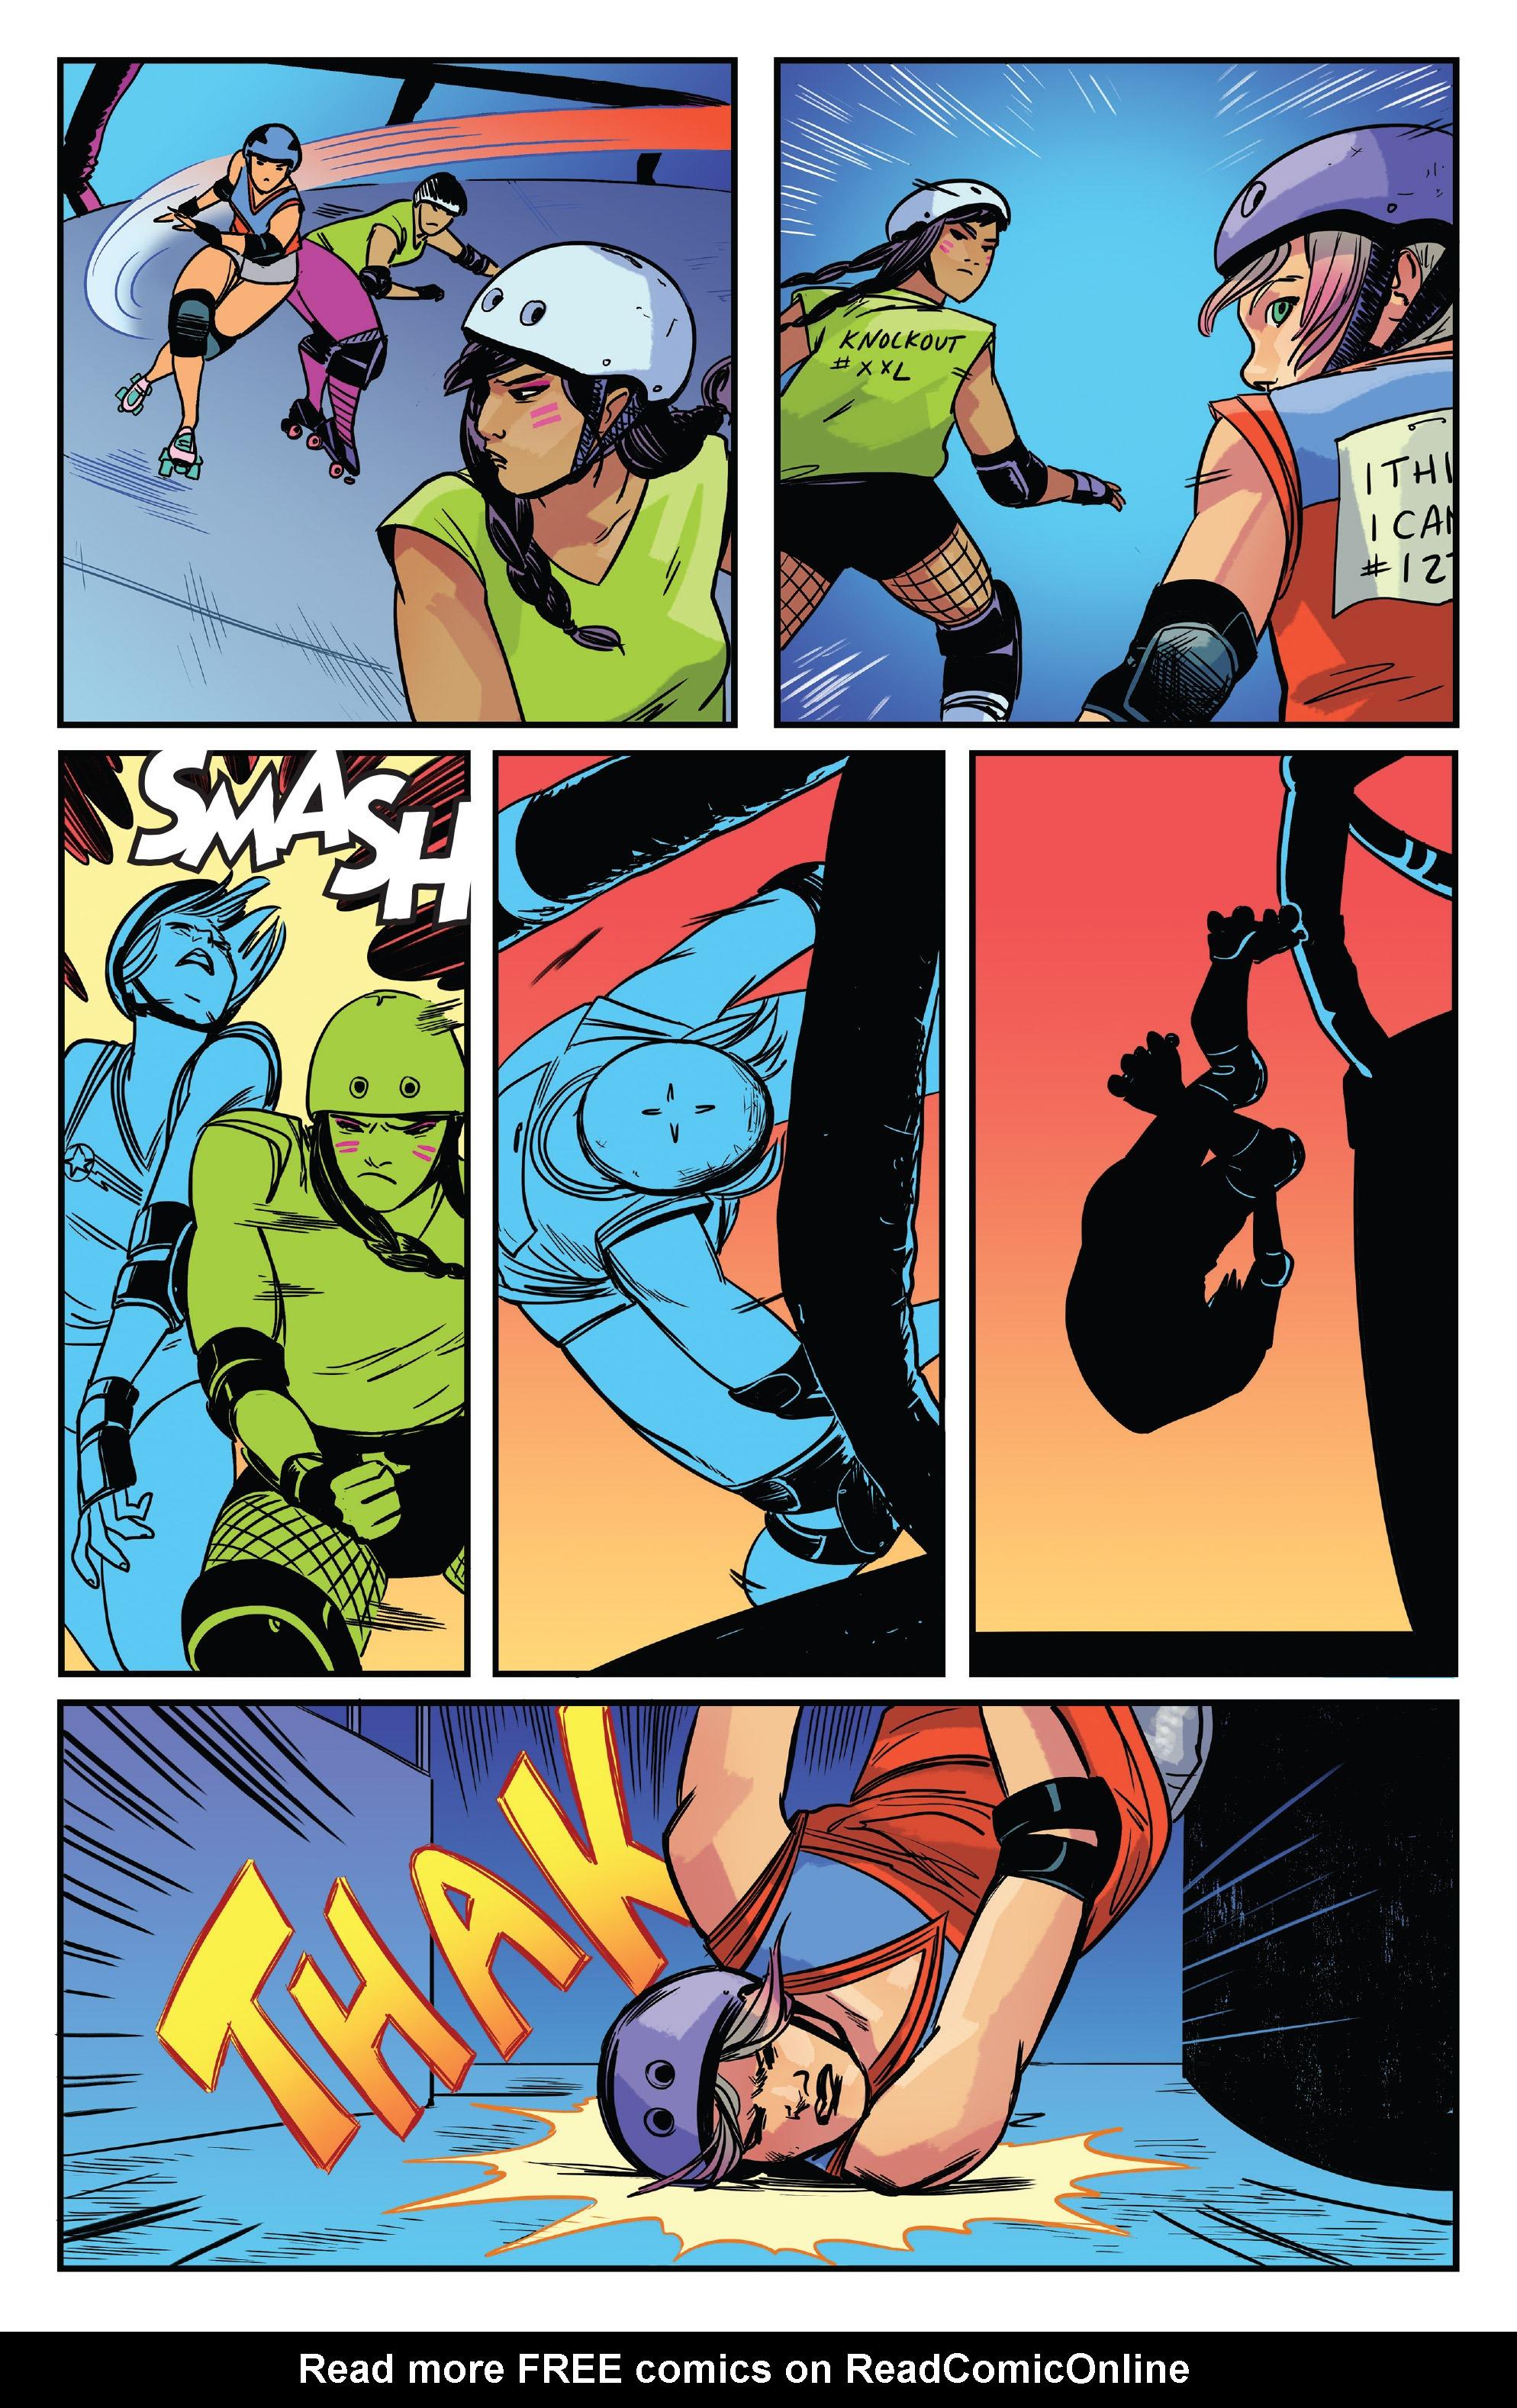 Read online Slam! comic -  Issue #4 - 21